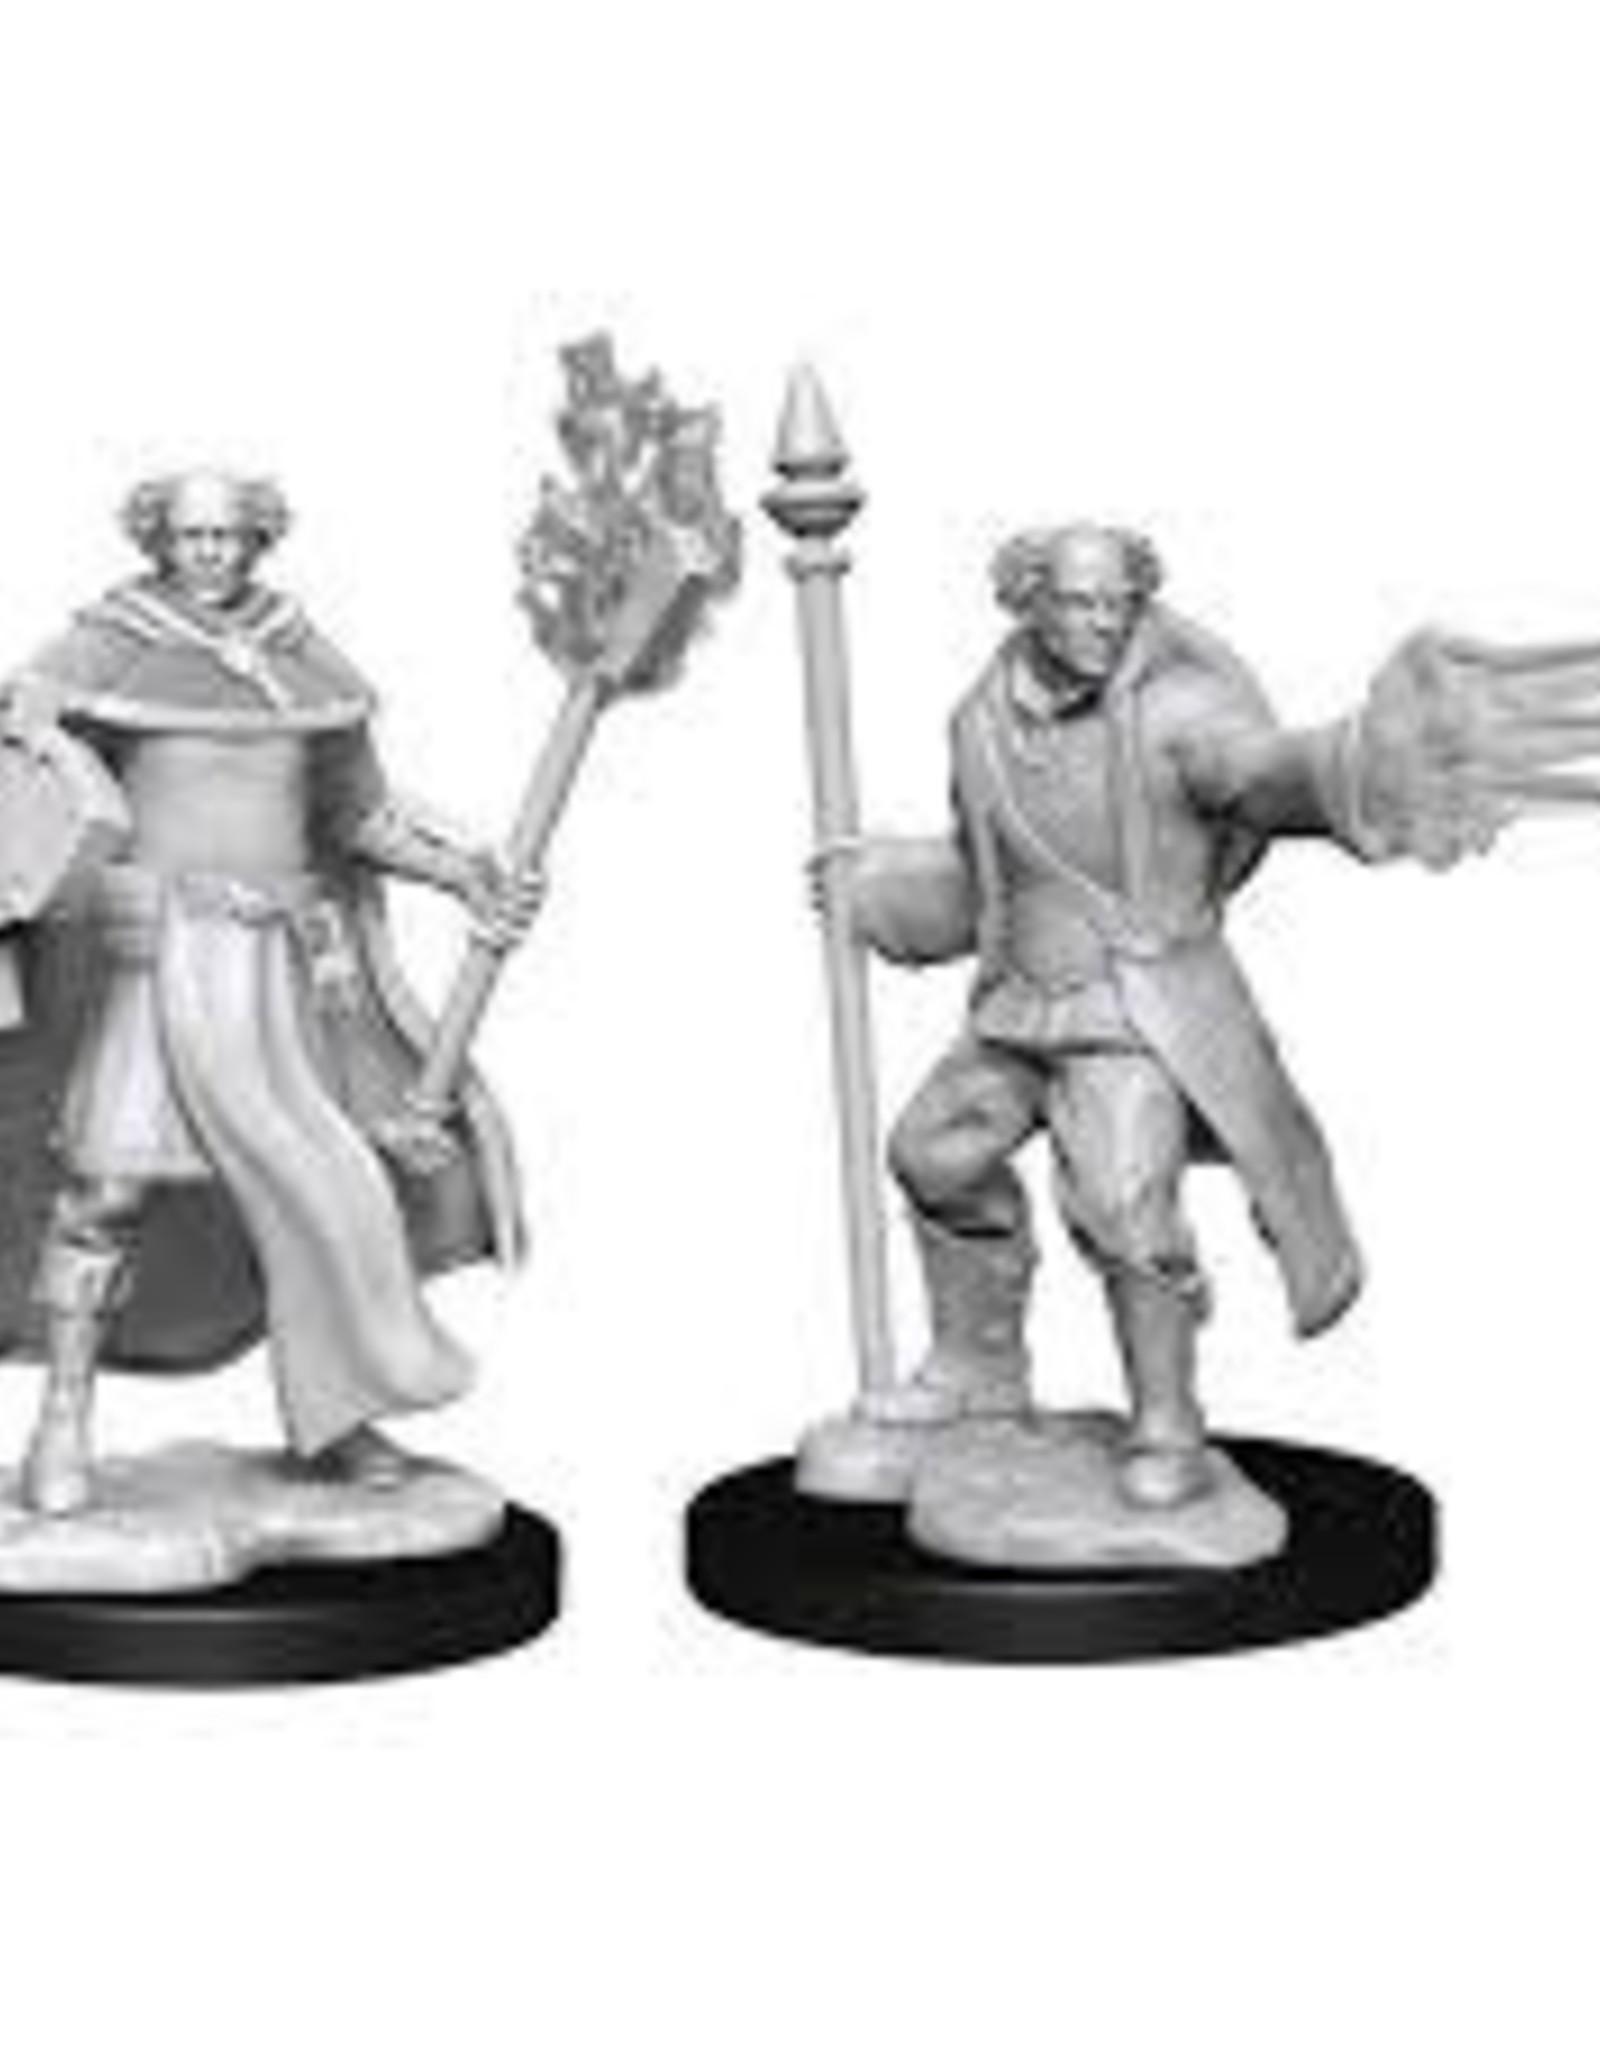 WizKids D&D Nolzur Multiclass Cleric/Wizard (He/Him/They/Them)